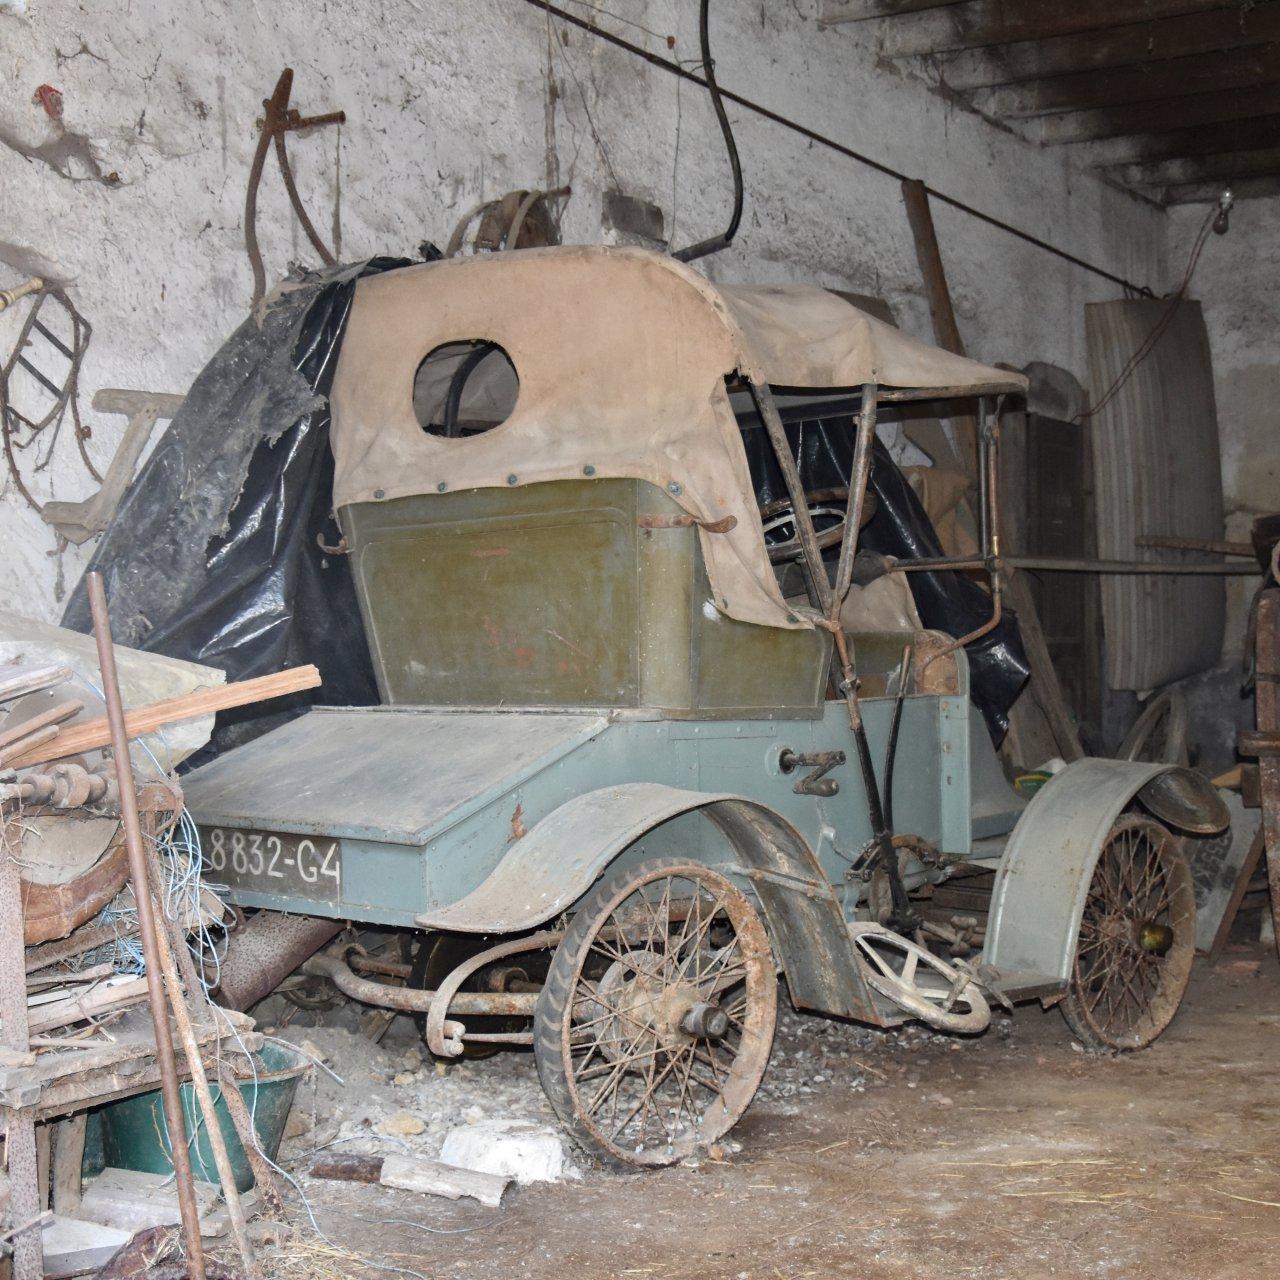 Artcurial, Rally cars, barn-found 1903 De Dion Bouton headline Artcurial auction, ClassicCars.com Journal